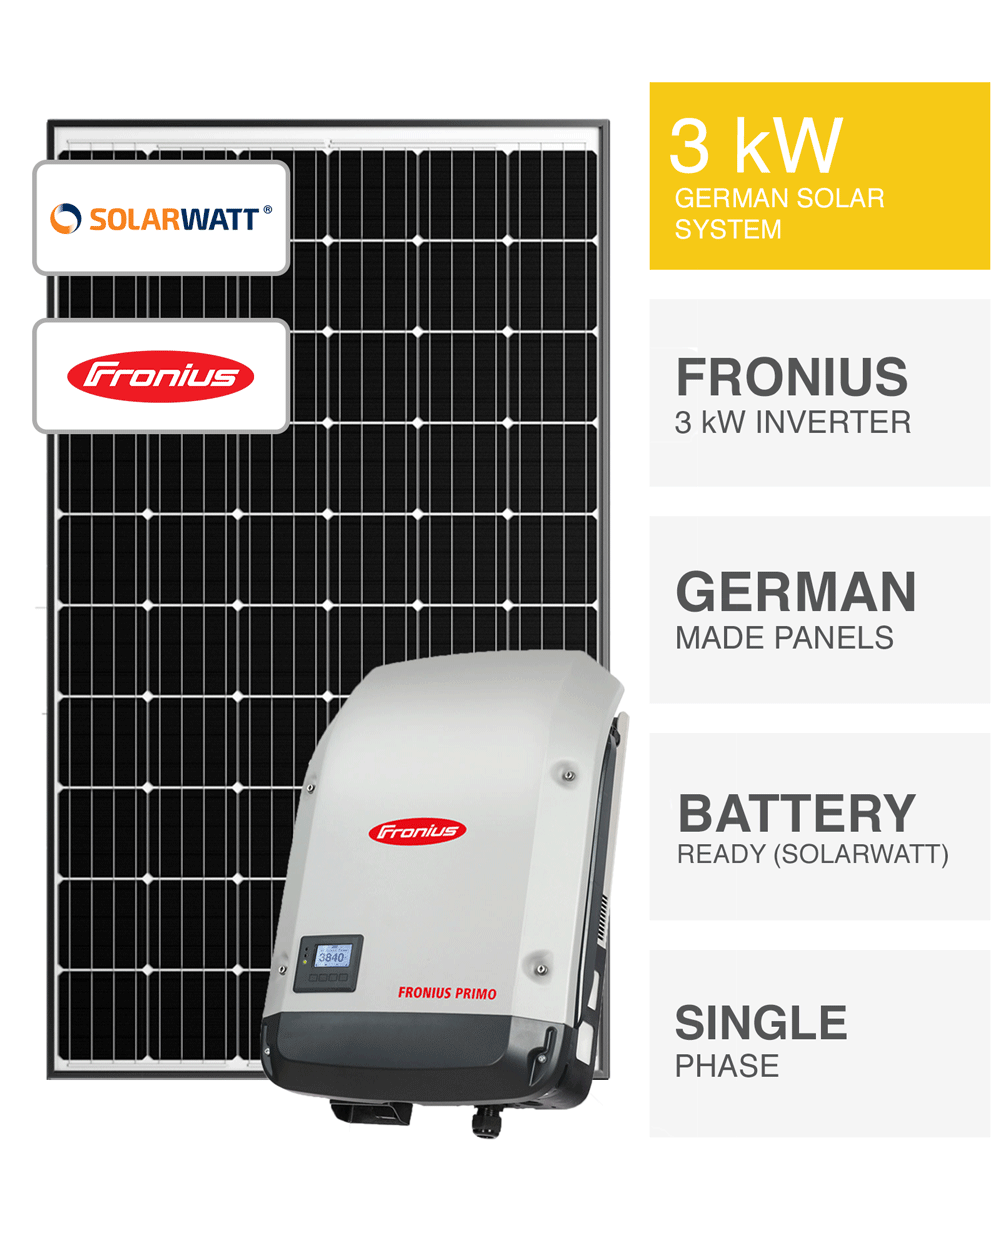 german 3kw solar system save more installed prices. Black Bedroom Furniture Sets. Home Design Ideas